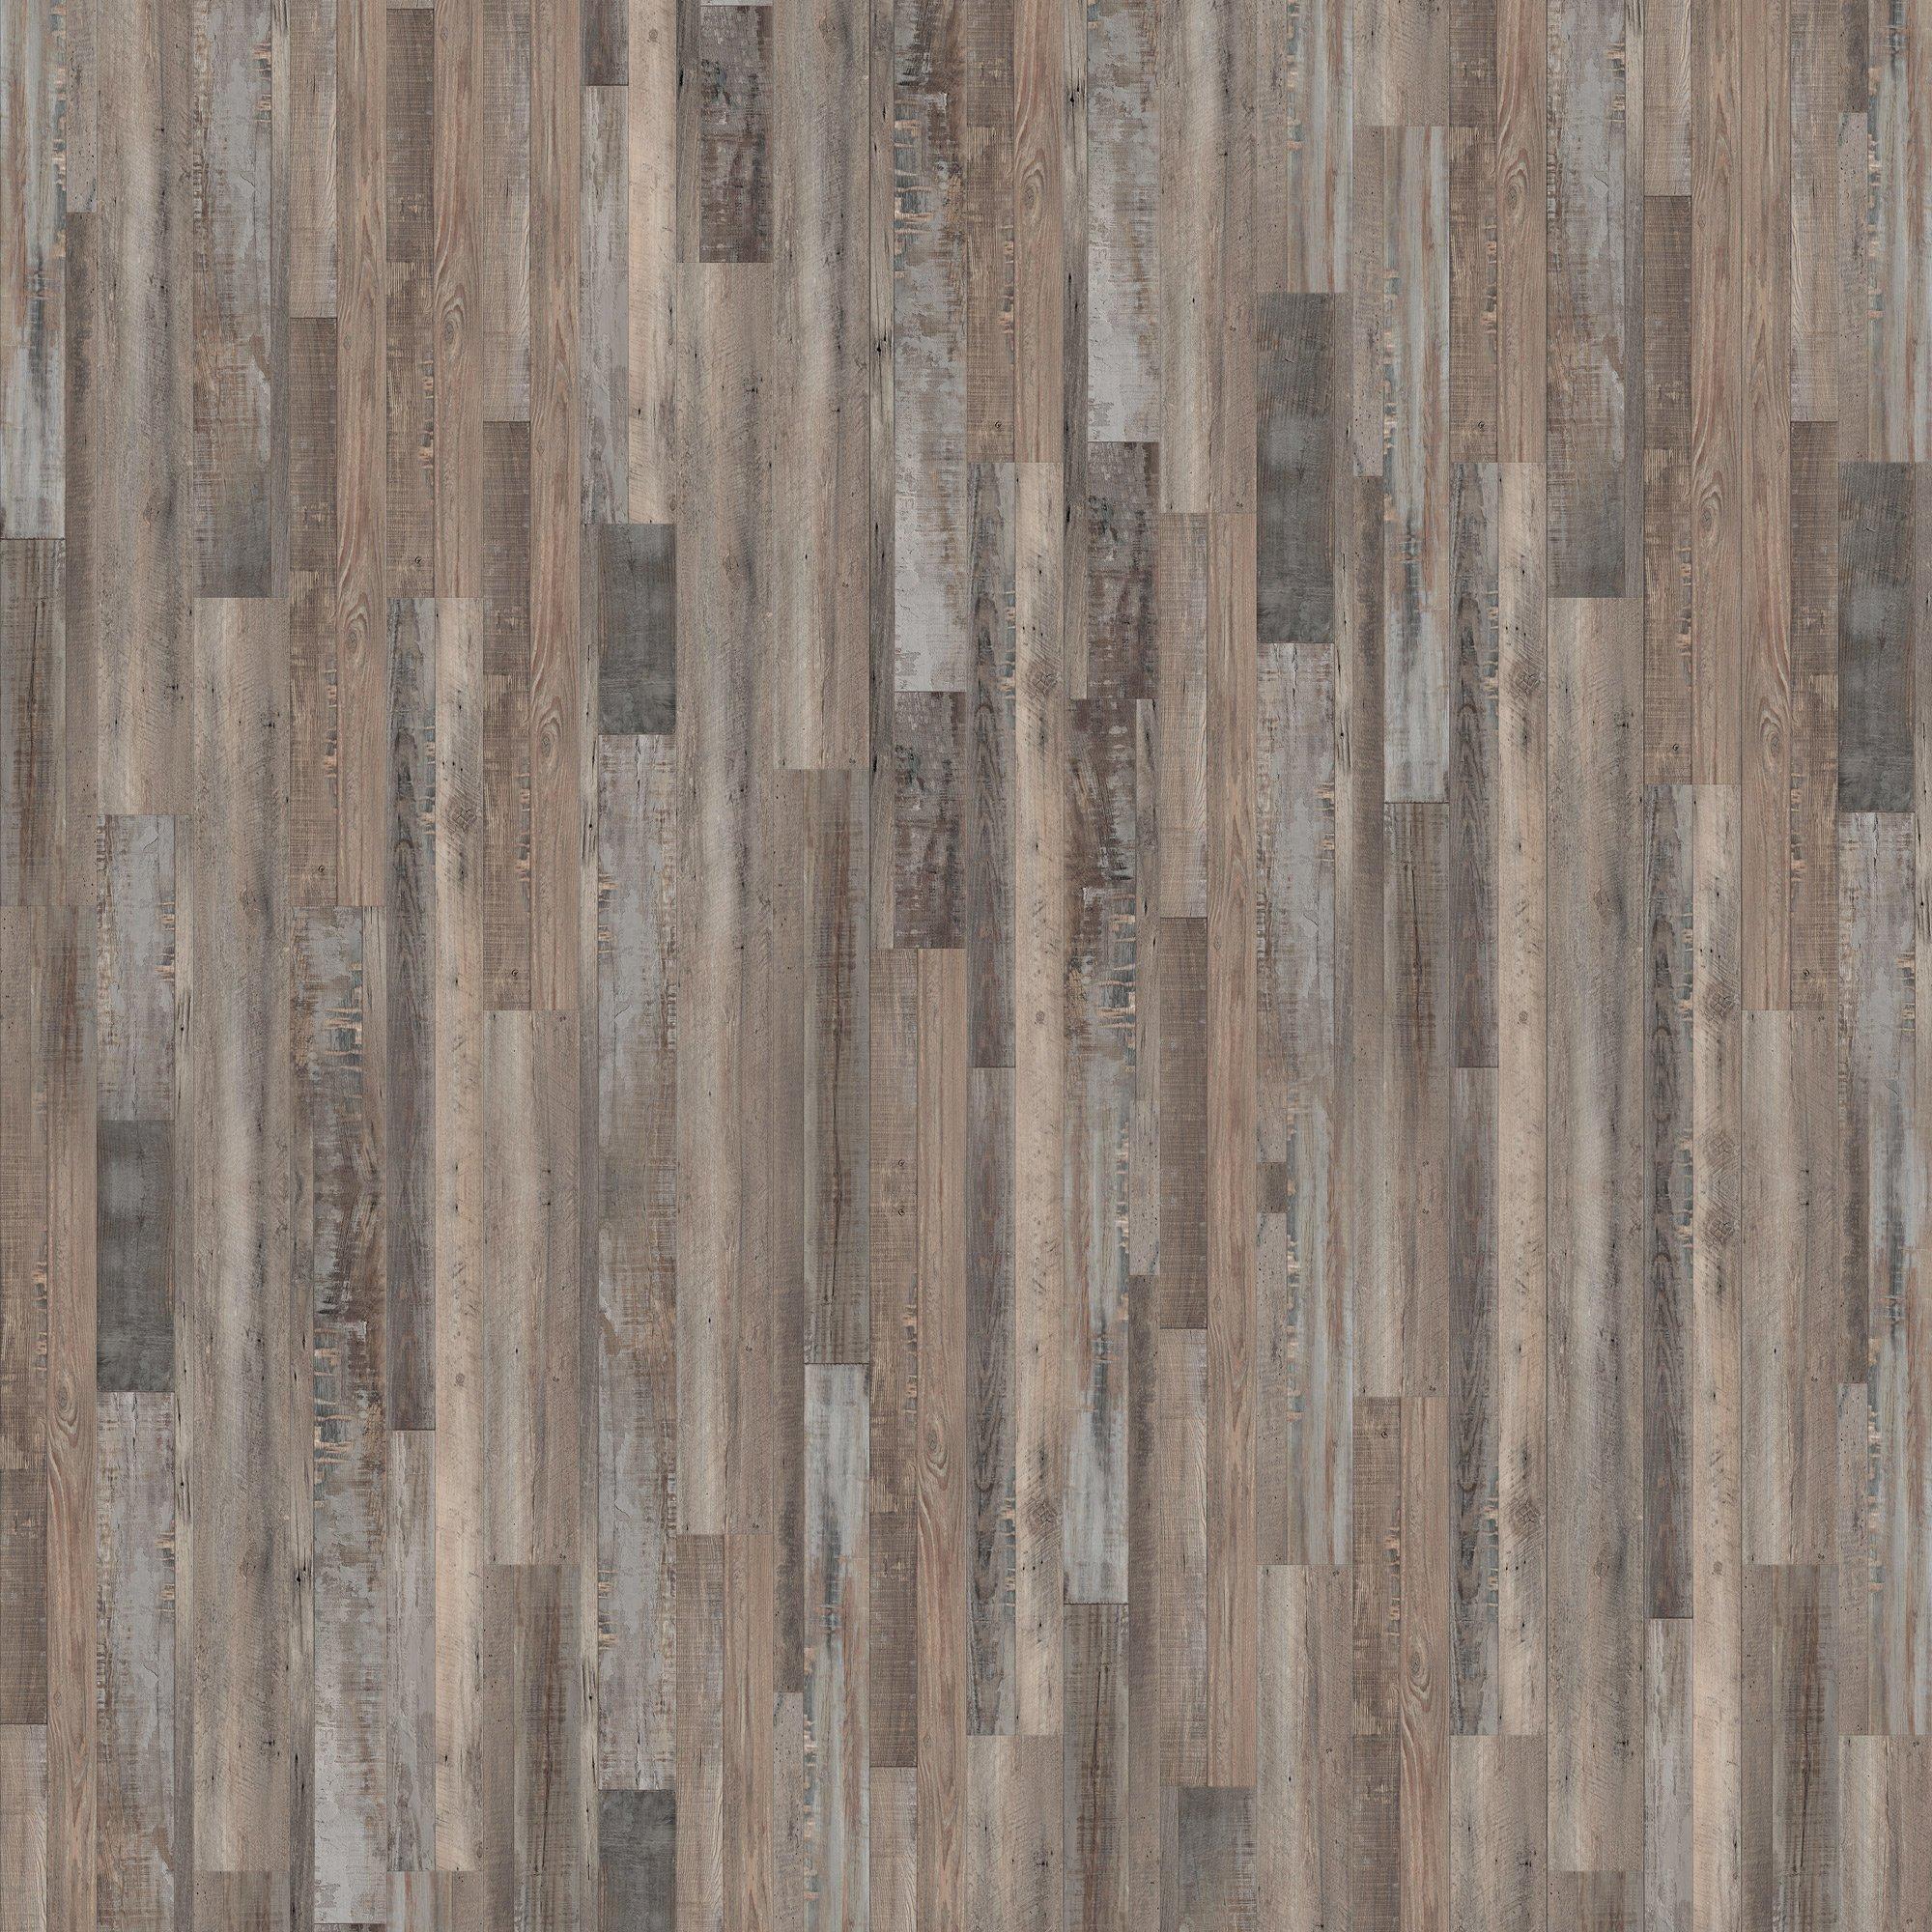 Cali Vinyl Pro Pet Proof Flooring, Redefined Pine (23.77 Sq Ft/box), 5.181 Lb